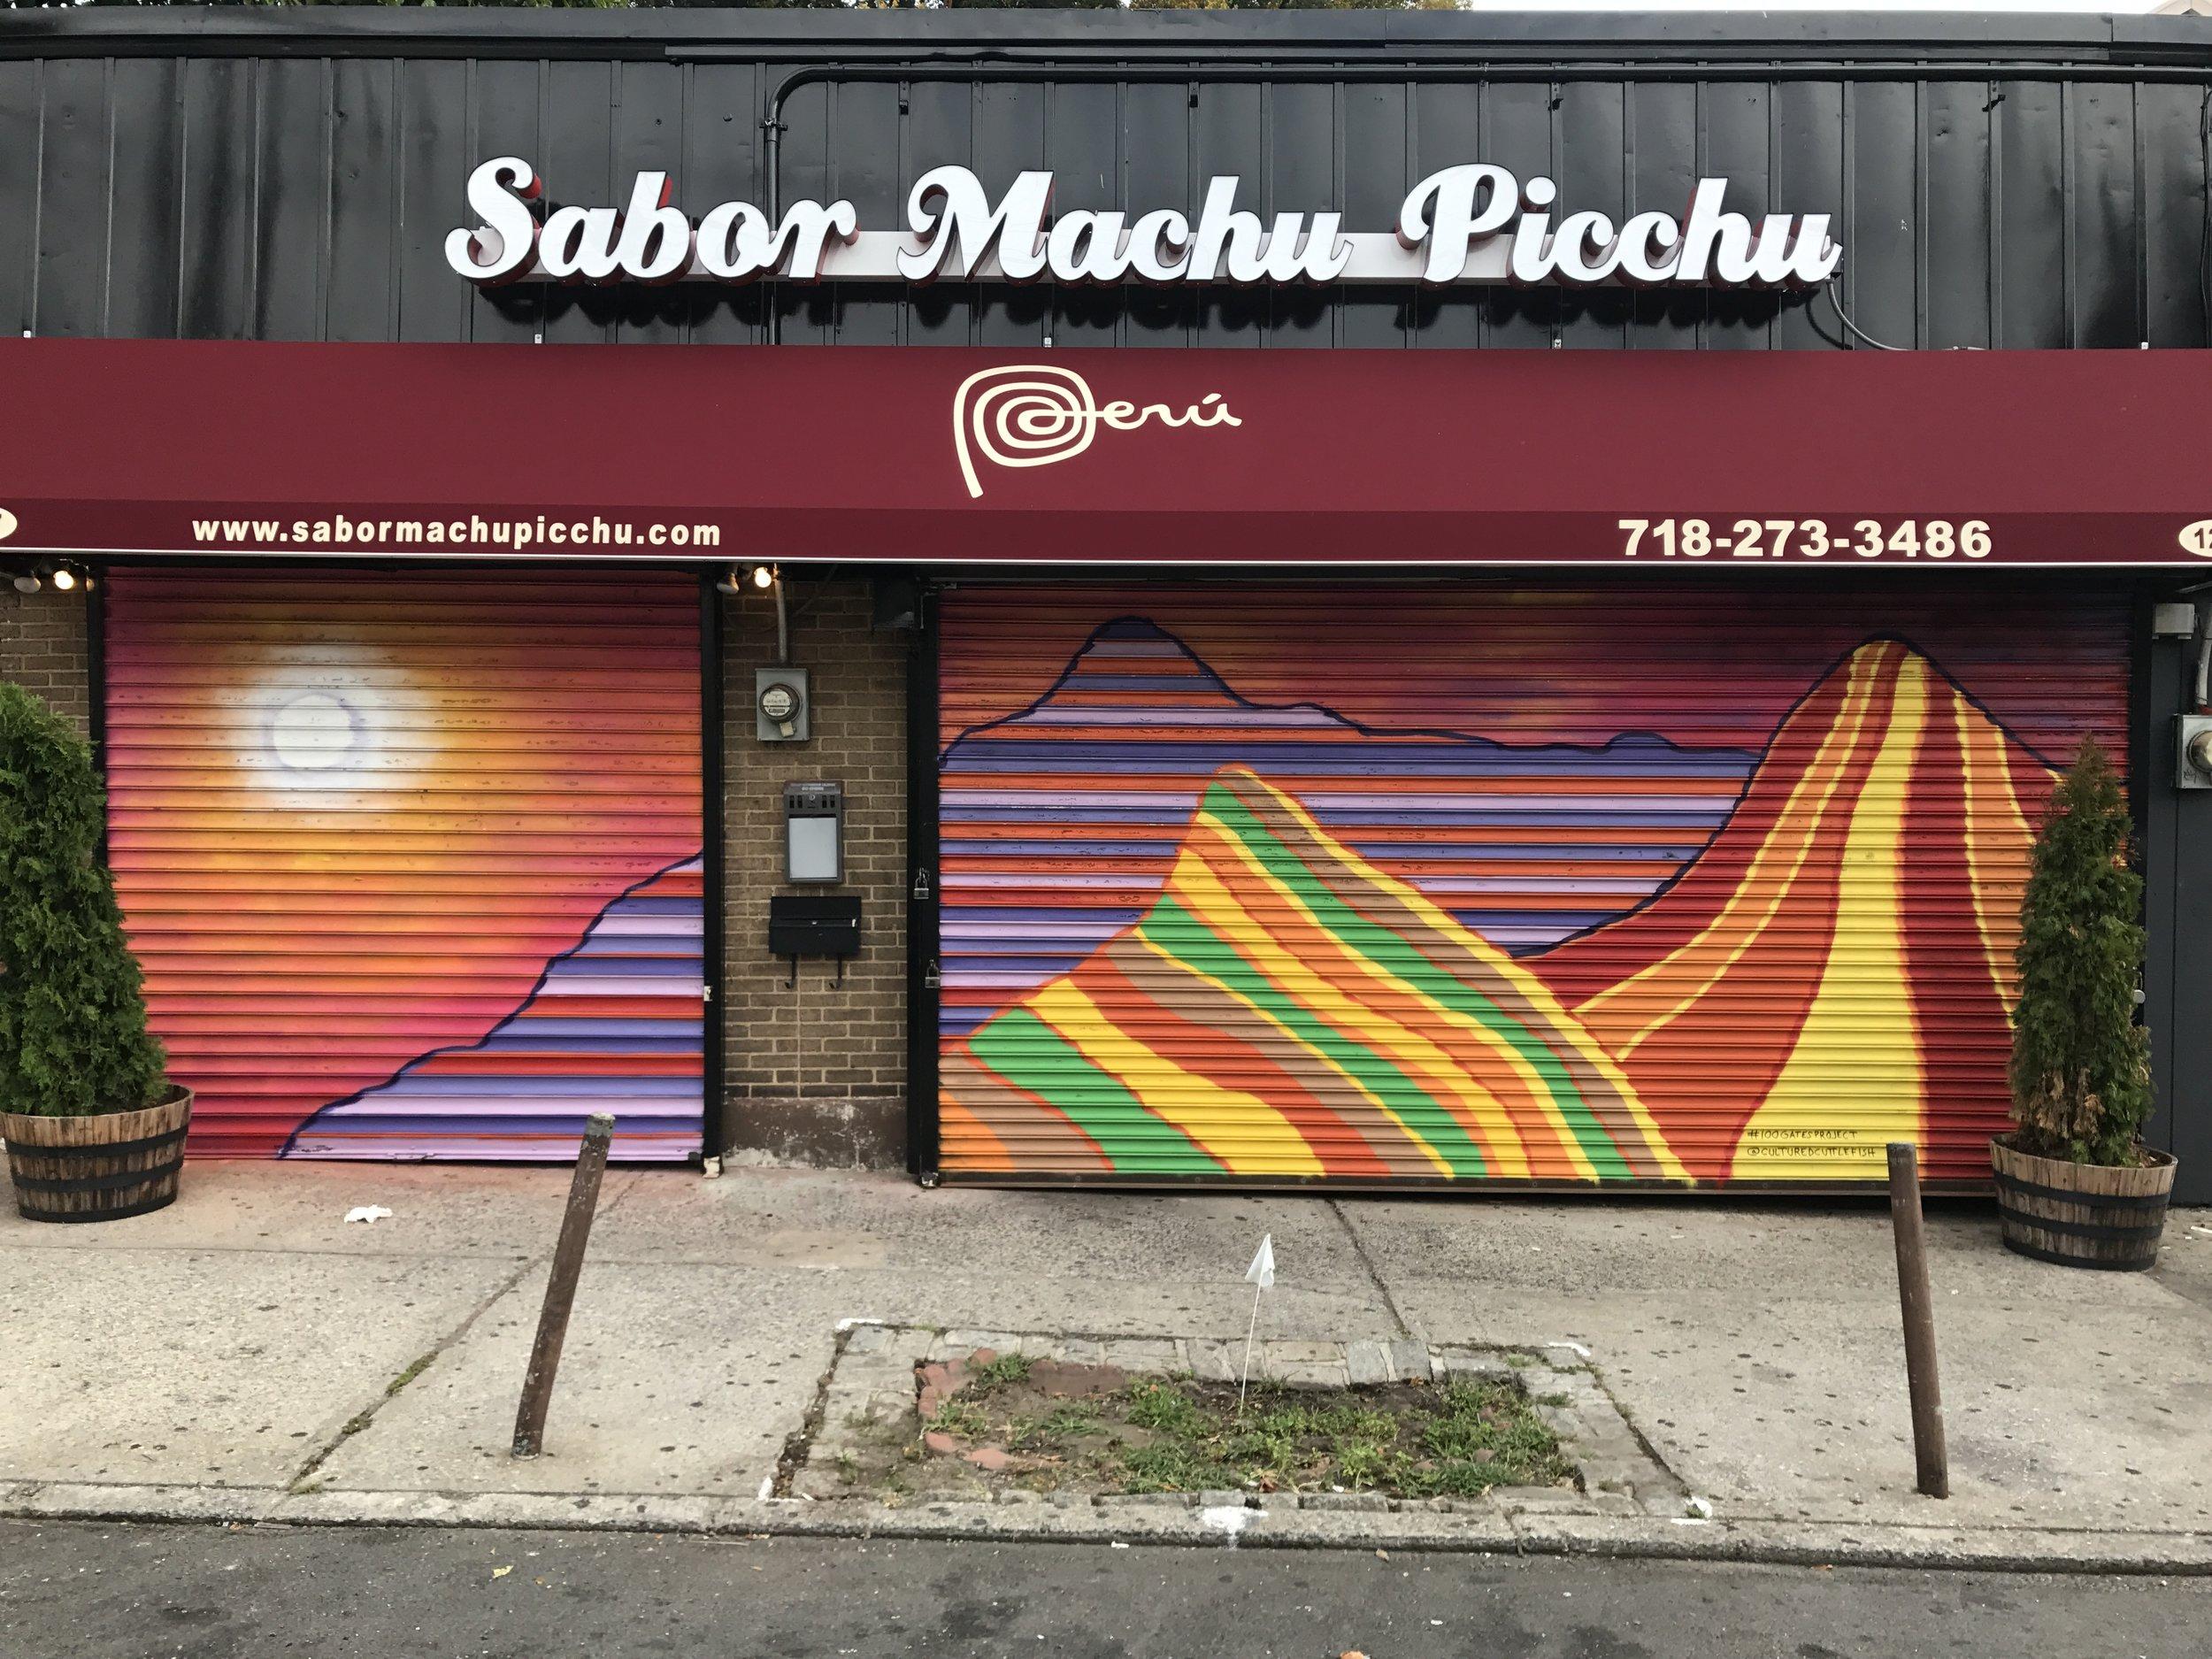 100 Gates Project  -- Staten Island expansion, Sabor Machu Picchu,Staten Island, NYC. 2017